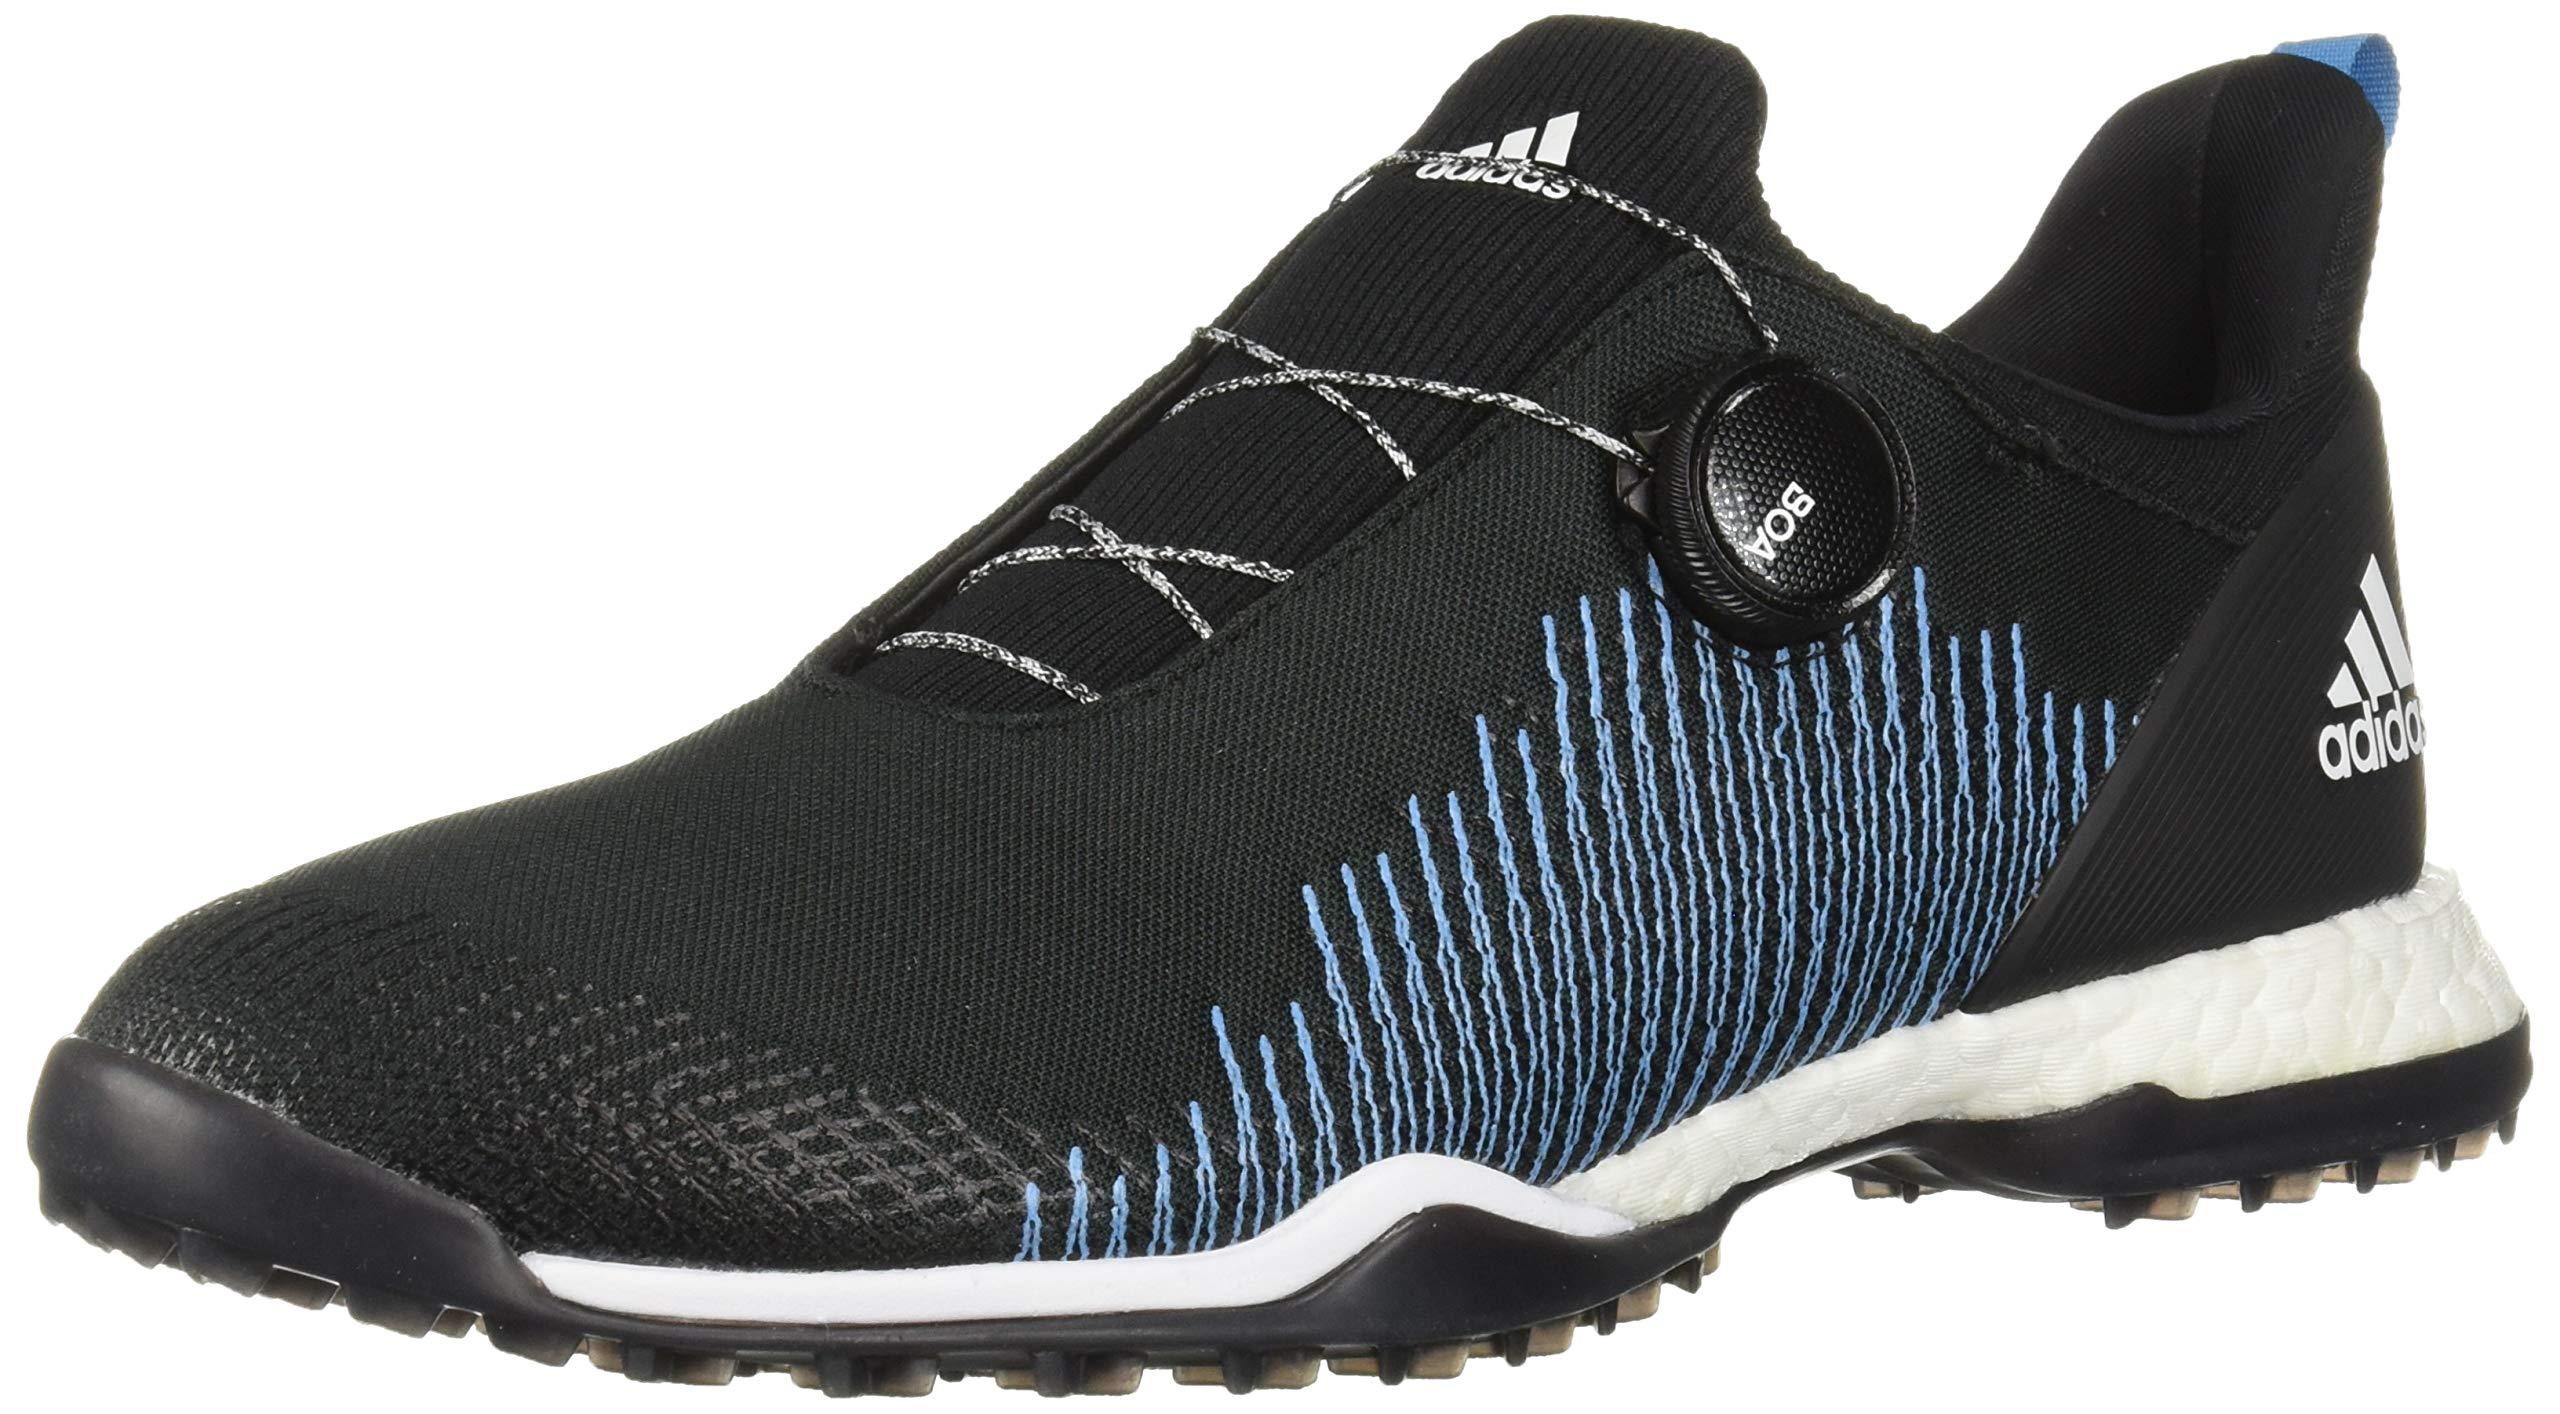 adidas Womens FORGEFIBER BOA Golf Shoe, core Black/FTWR White/Shock Cyan, 8 M US by adidas